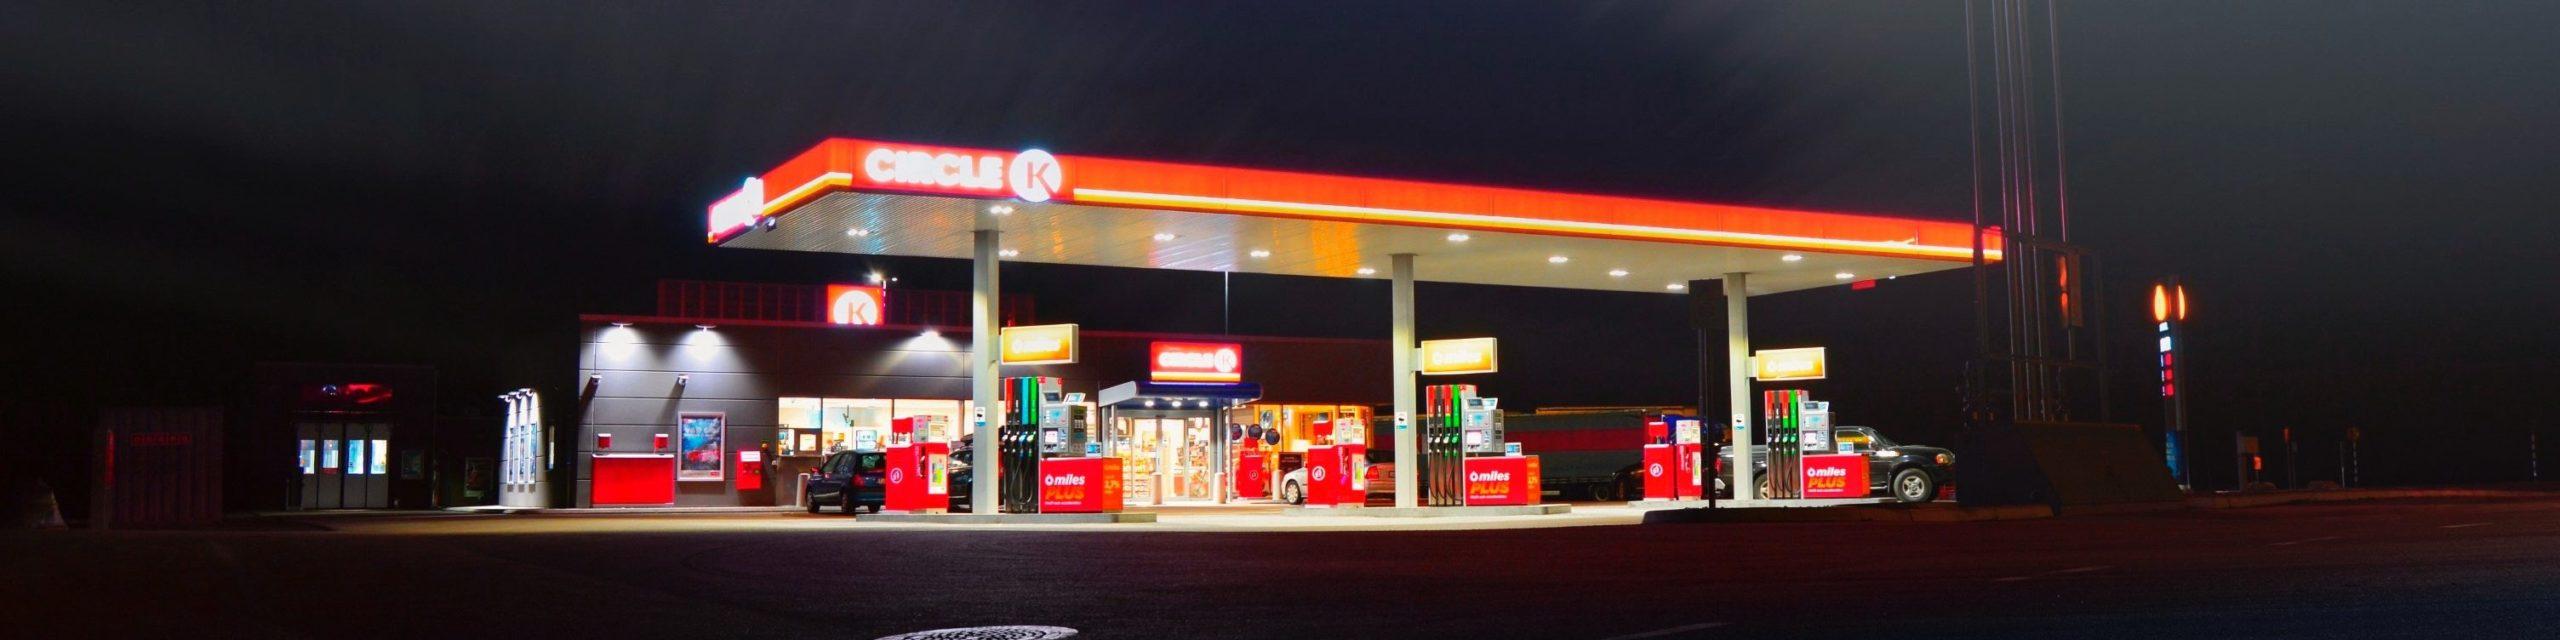 Biodégradation des carburants - France Organo Chimique